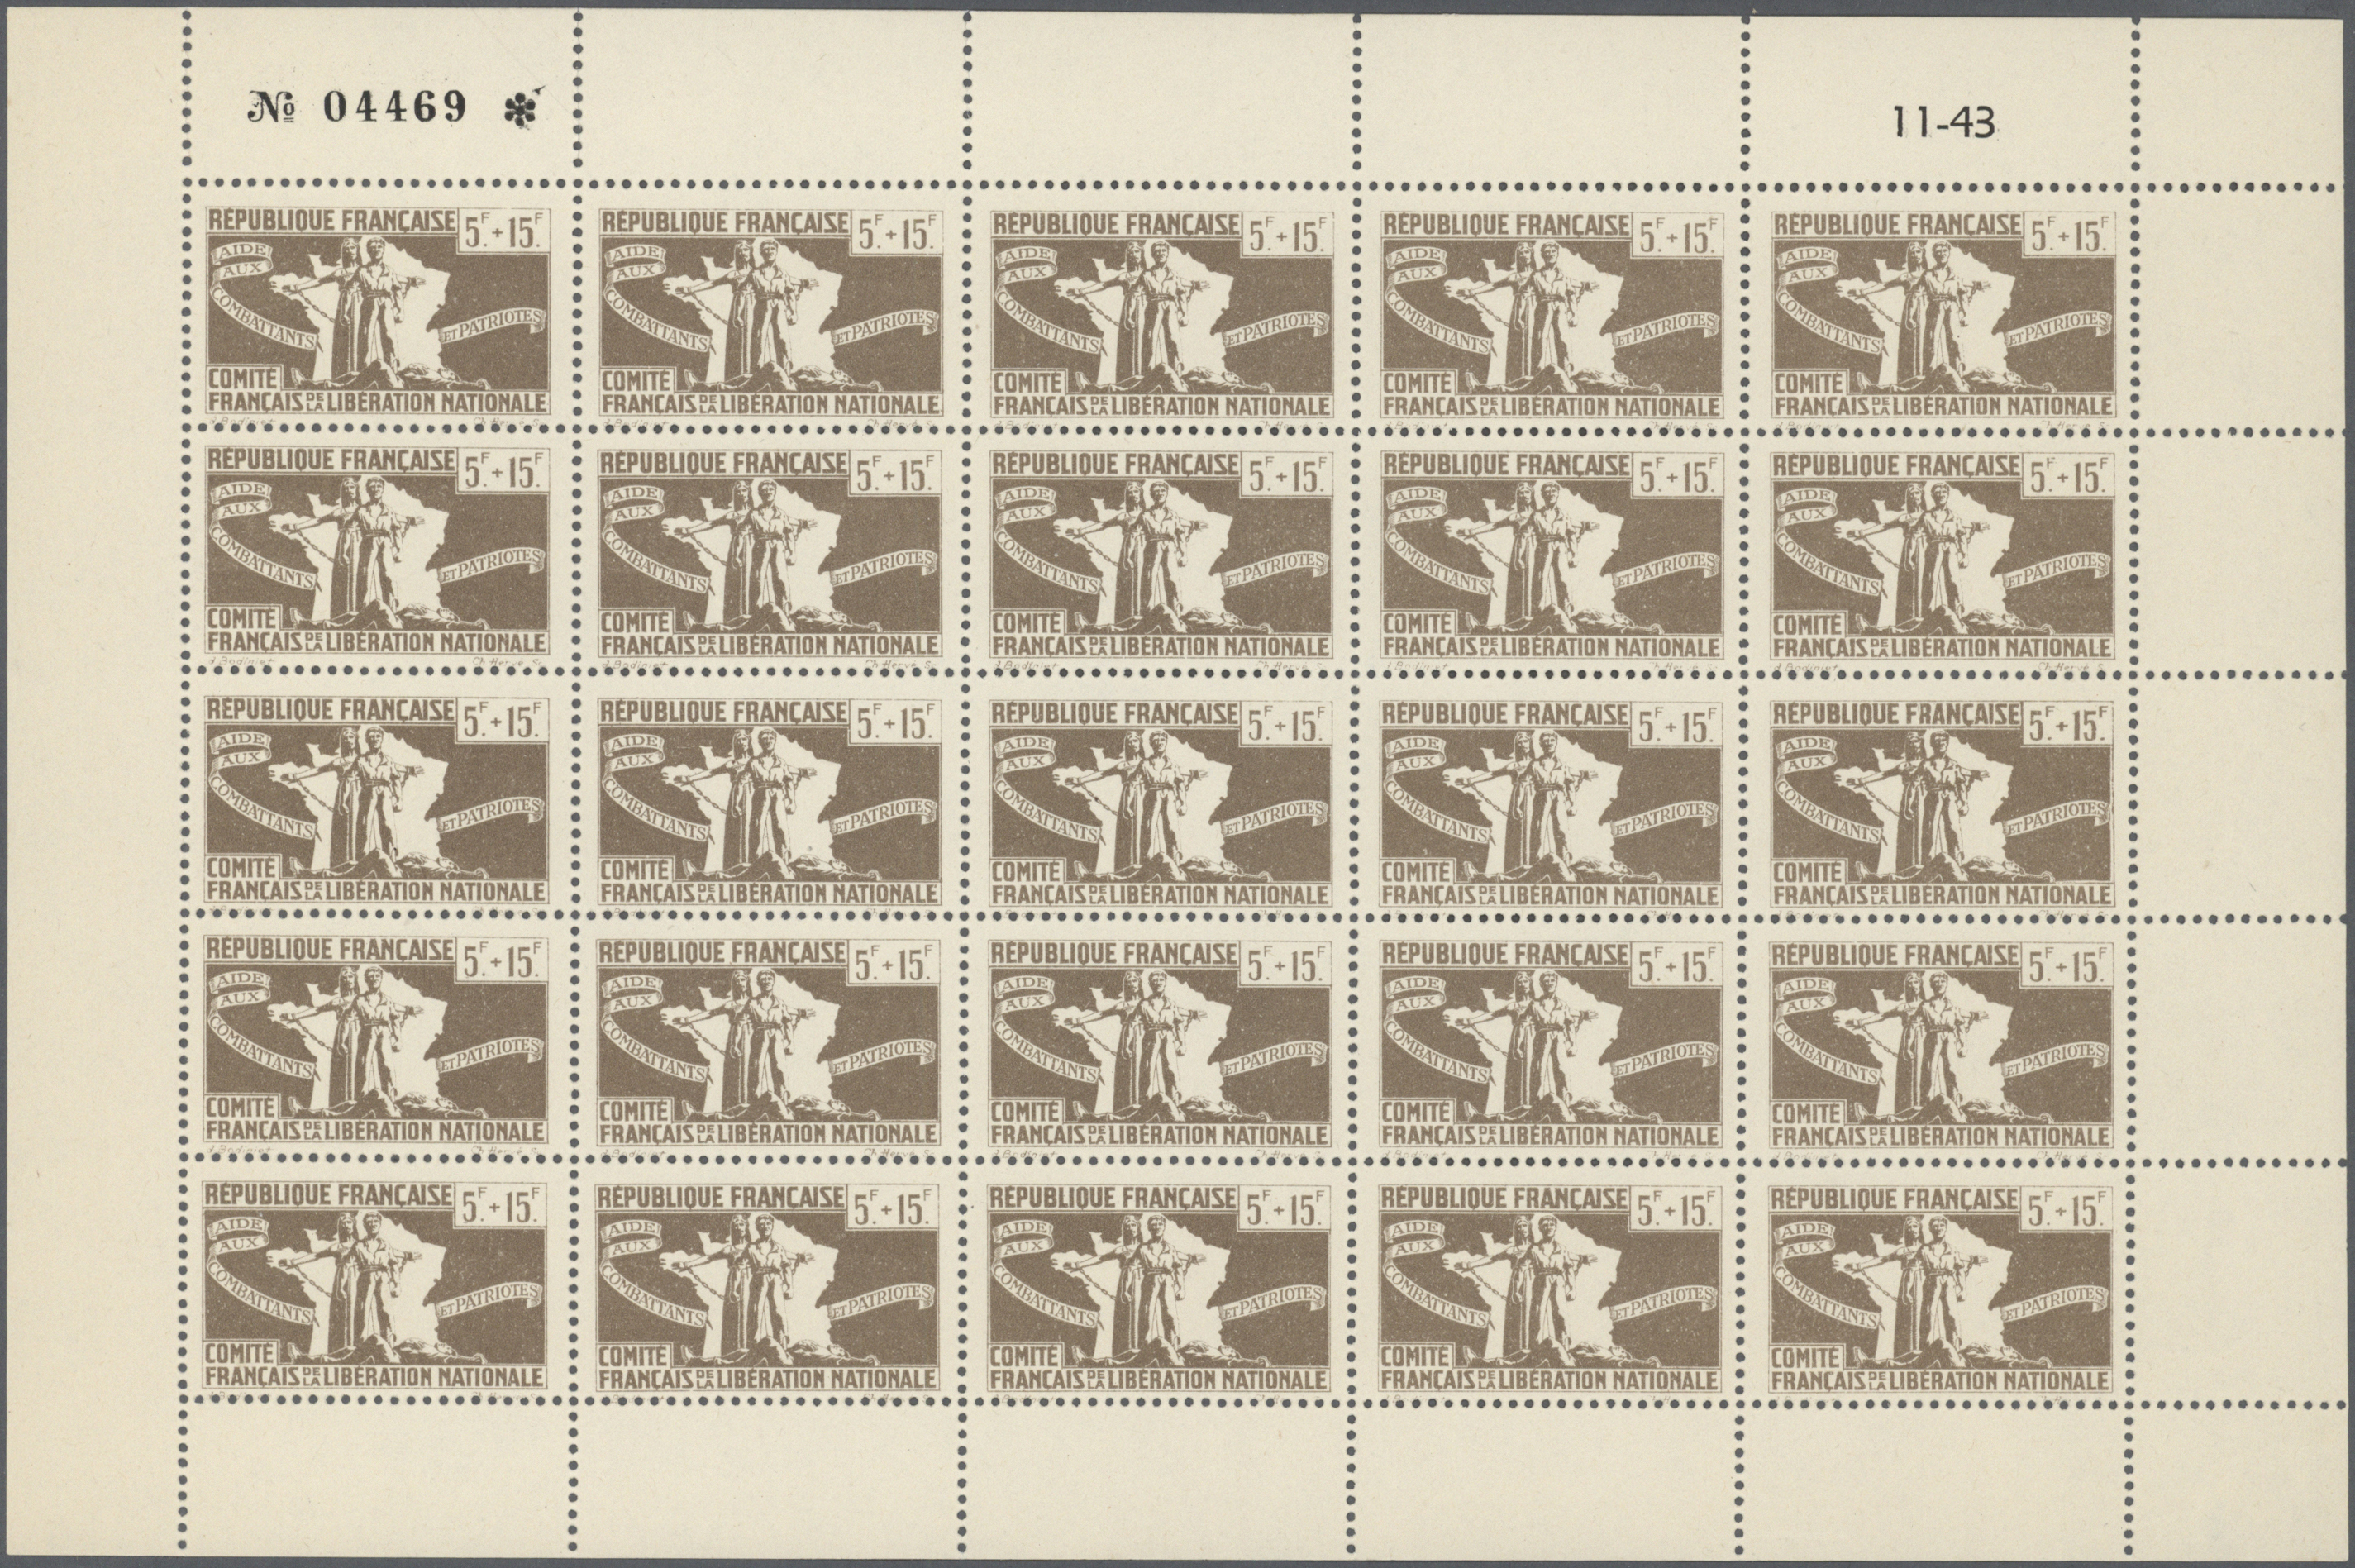 Lot 13167 - Algerien - Nationales Befreiungskomitee Algier  -  Auktionshaus Christoph Gärtner GmbH & Co. KG Single lots Philately Overseas & Europe. Auction #39 Day 4